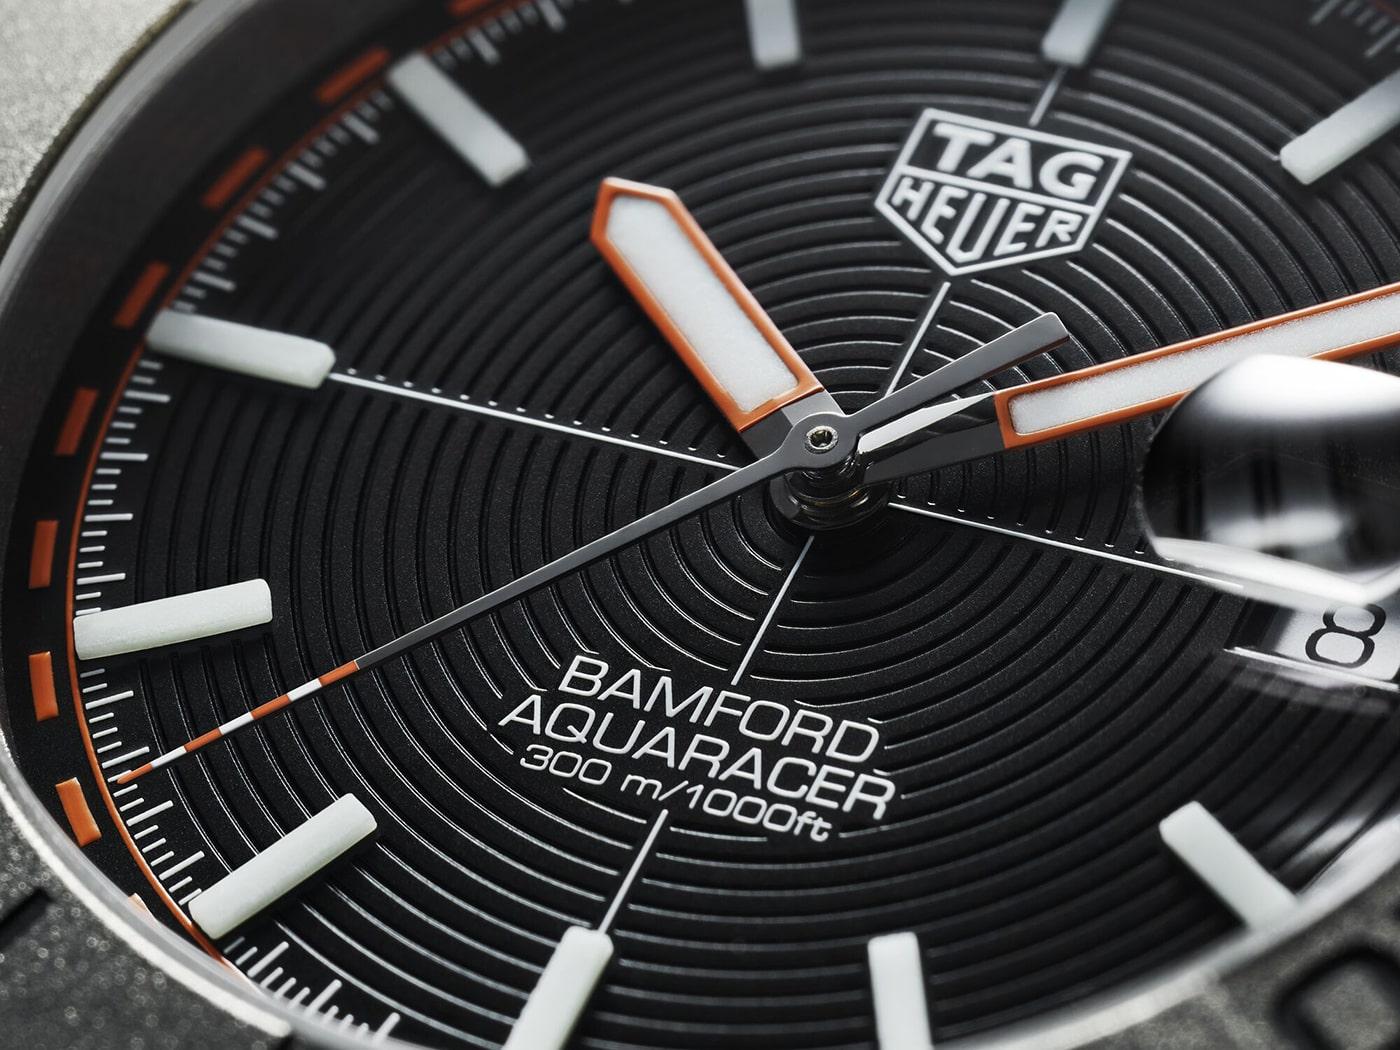 TAG Heuer Aquaracer Bamford Limited Edition 5 min